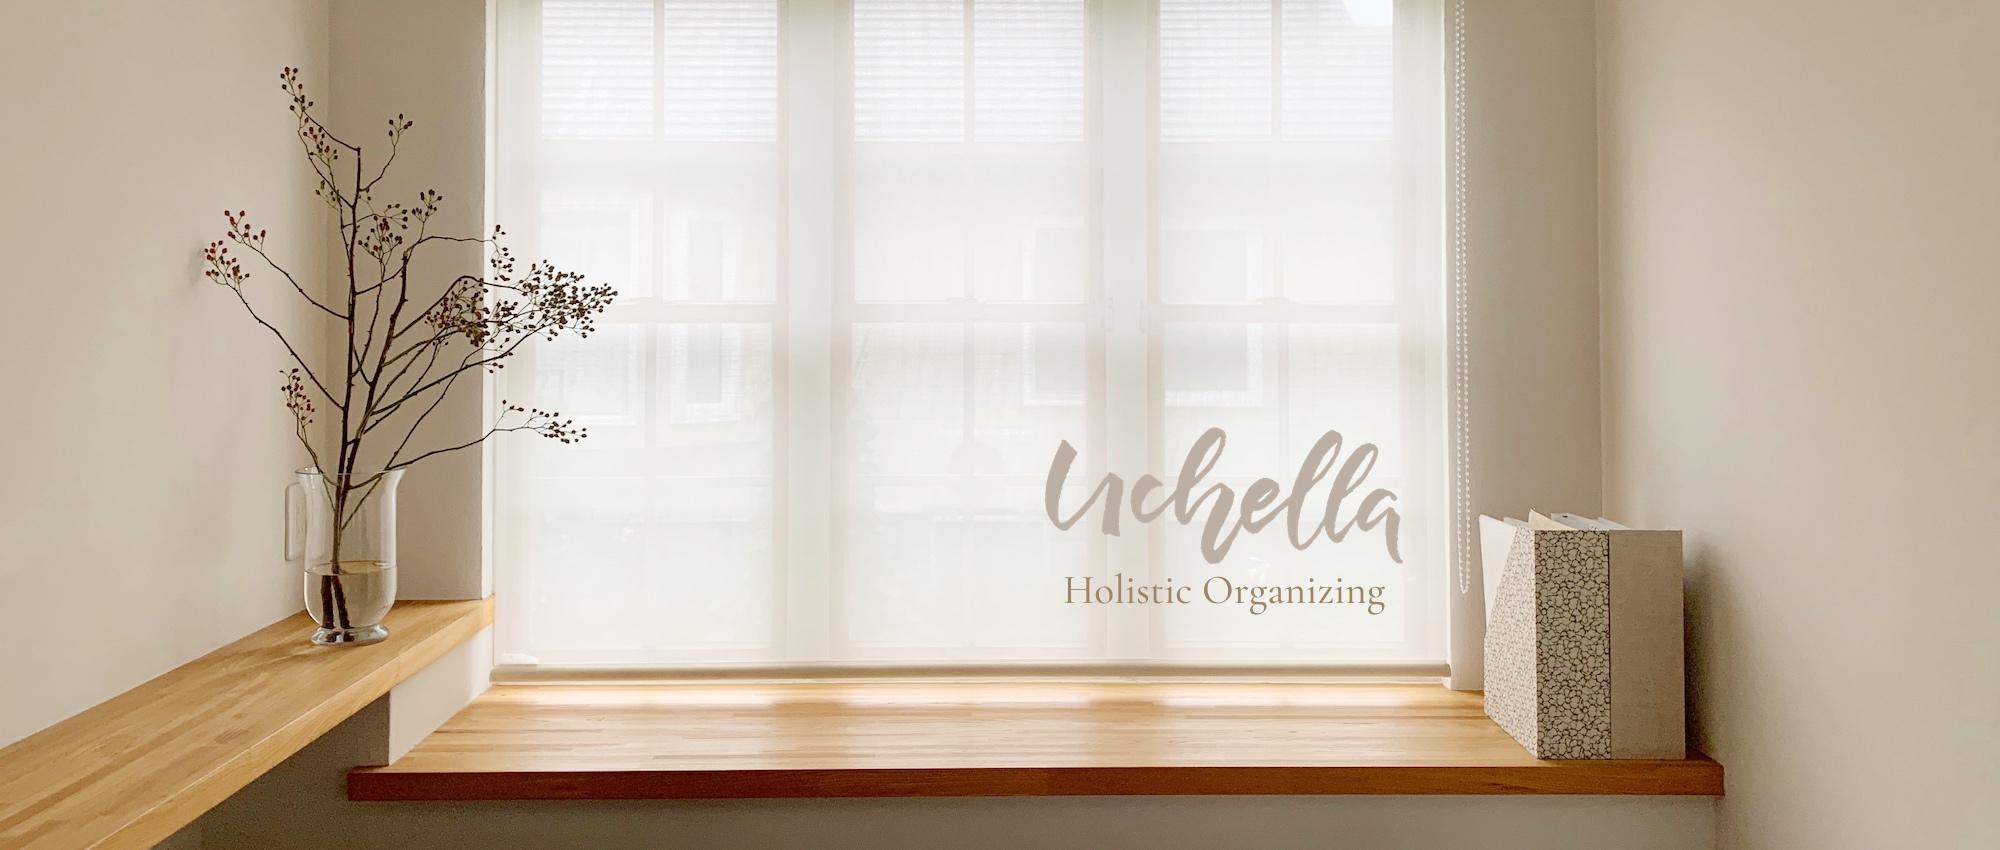 uchella.com